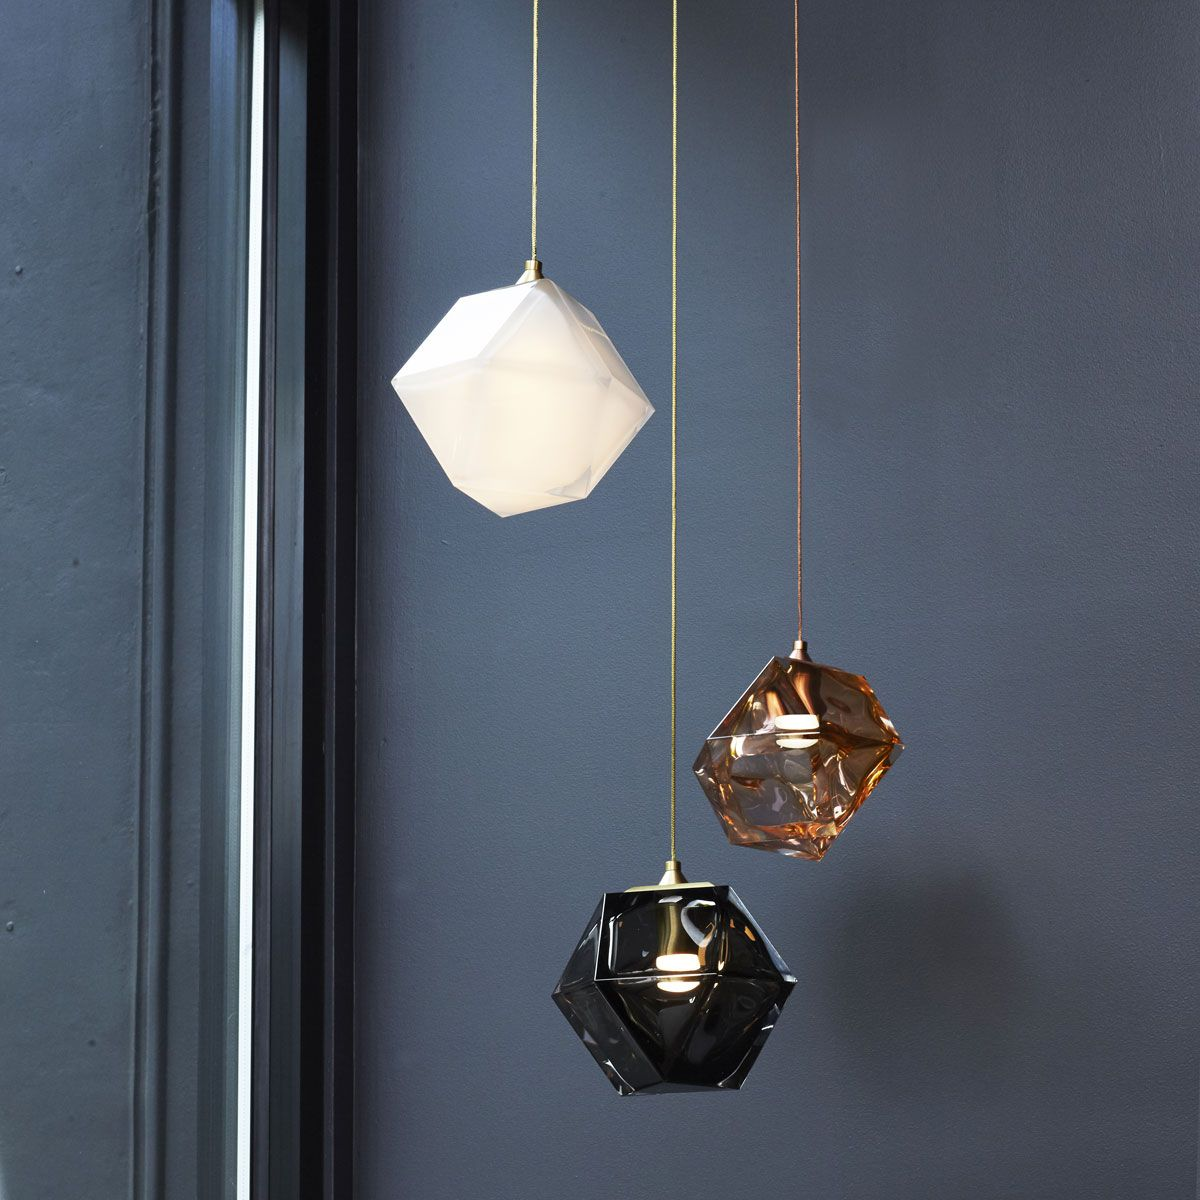 gabriel scott welles double blown glass luminaire design deco lighting pinterest. Black Bedroom Furniture Sets. Home Design Ideas